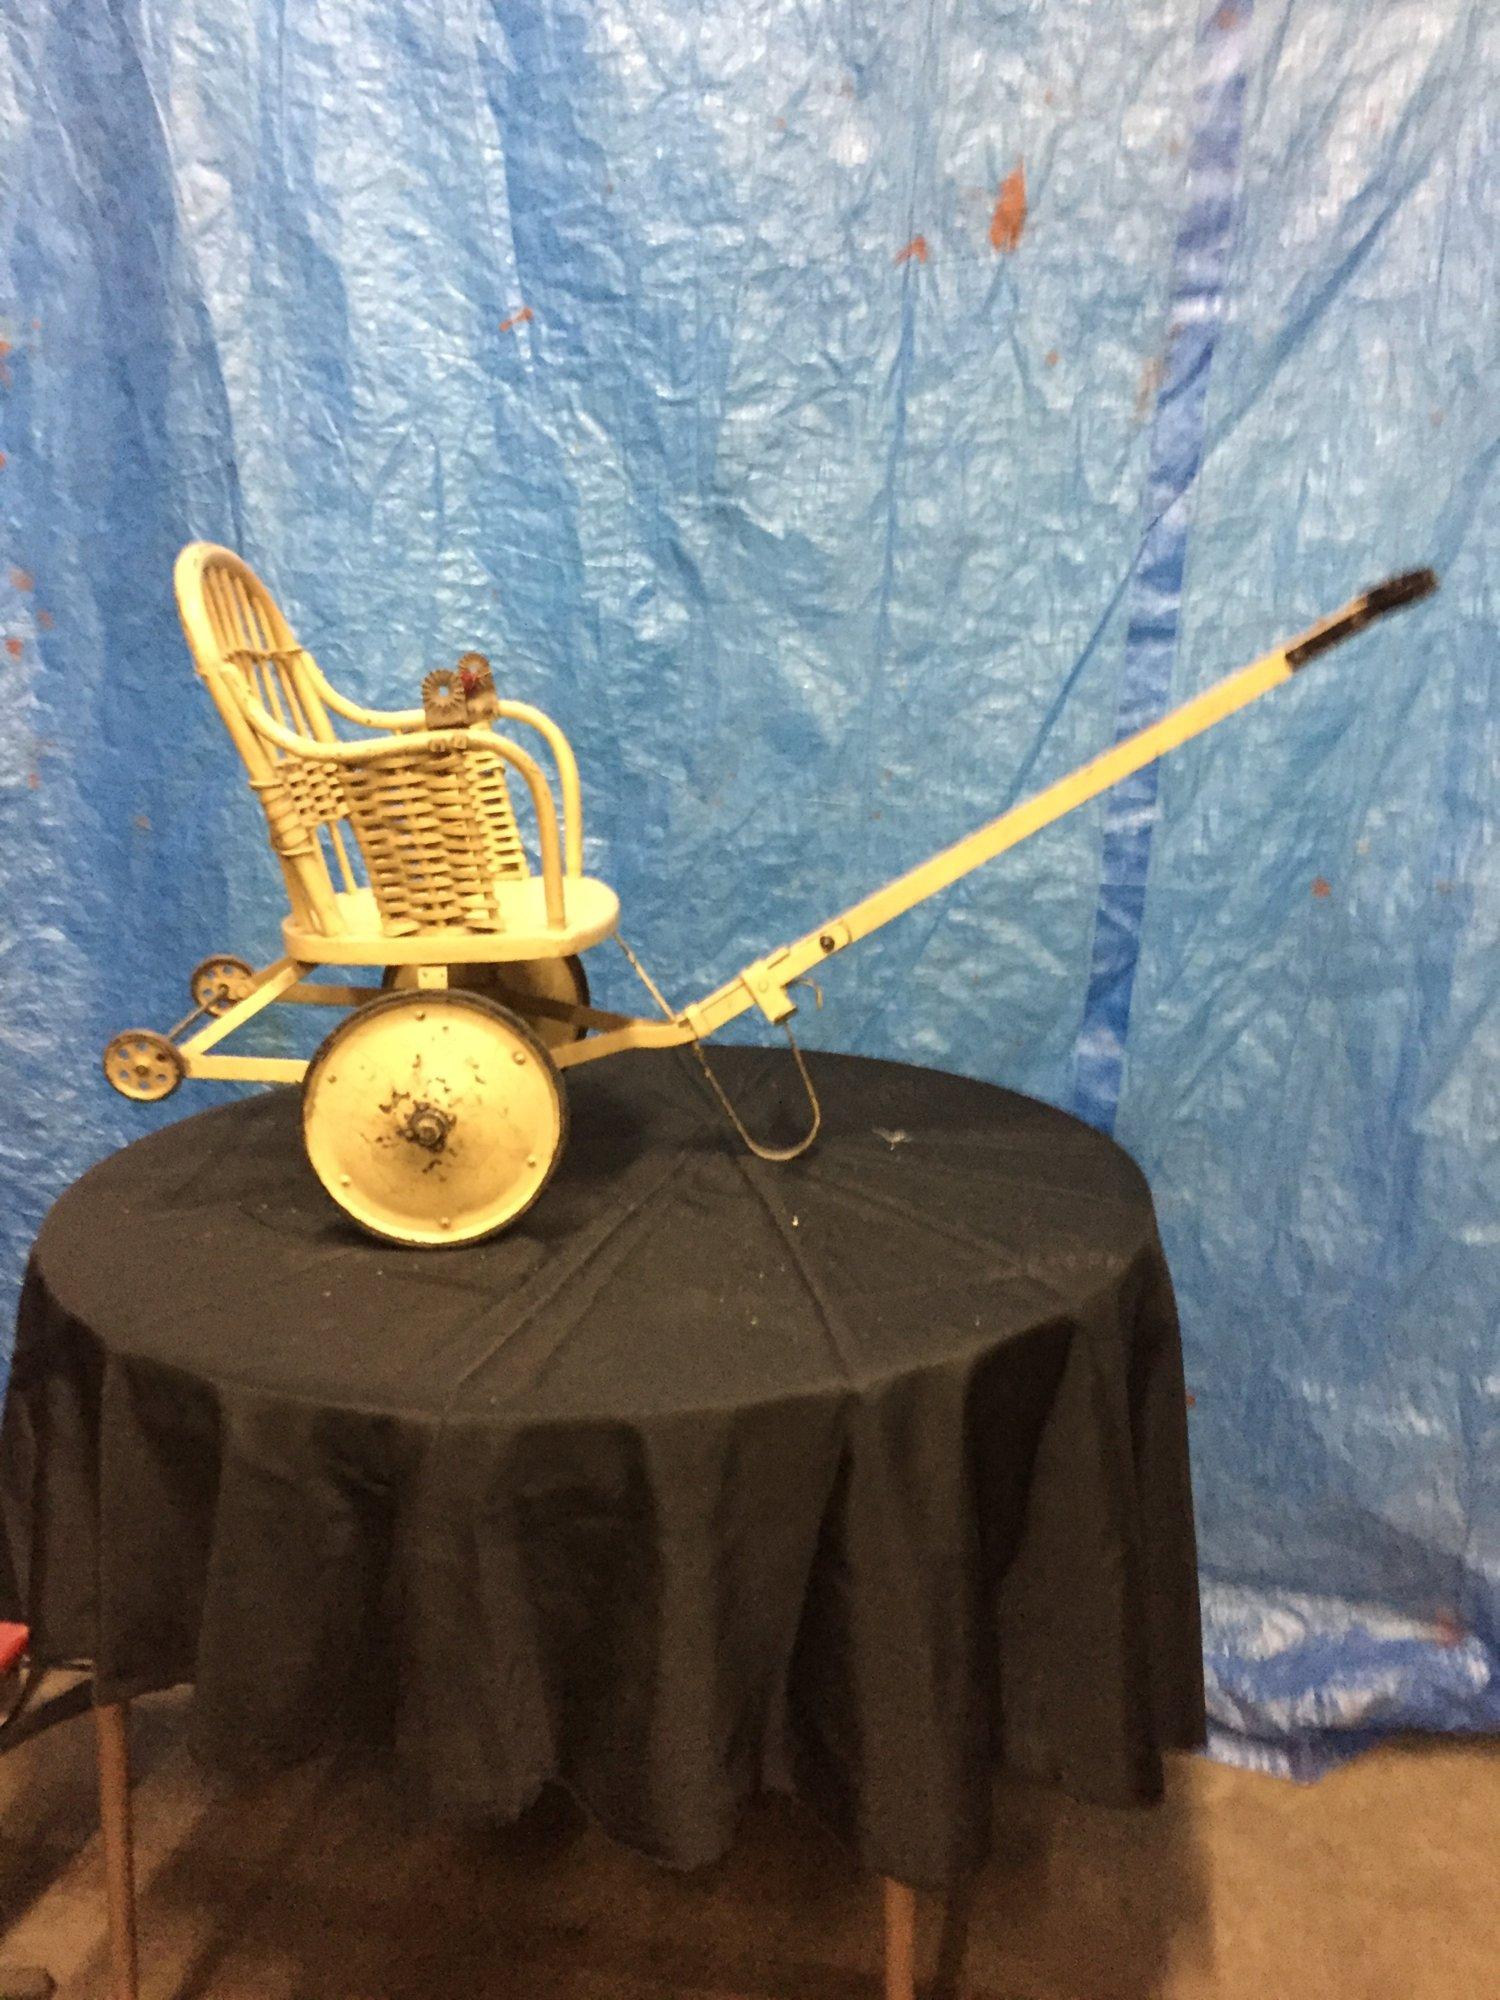 Vintage Baby Stroller with pull handle - $135.jpg